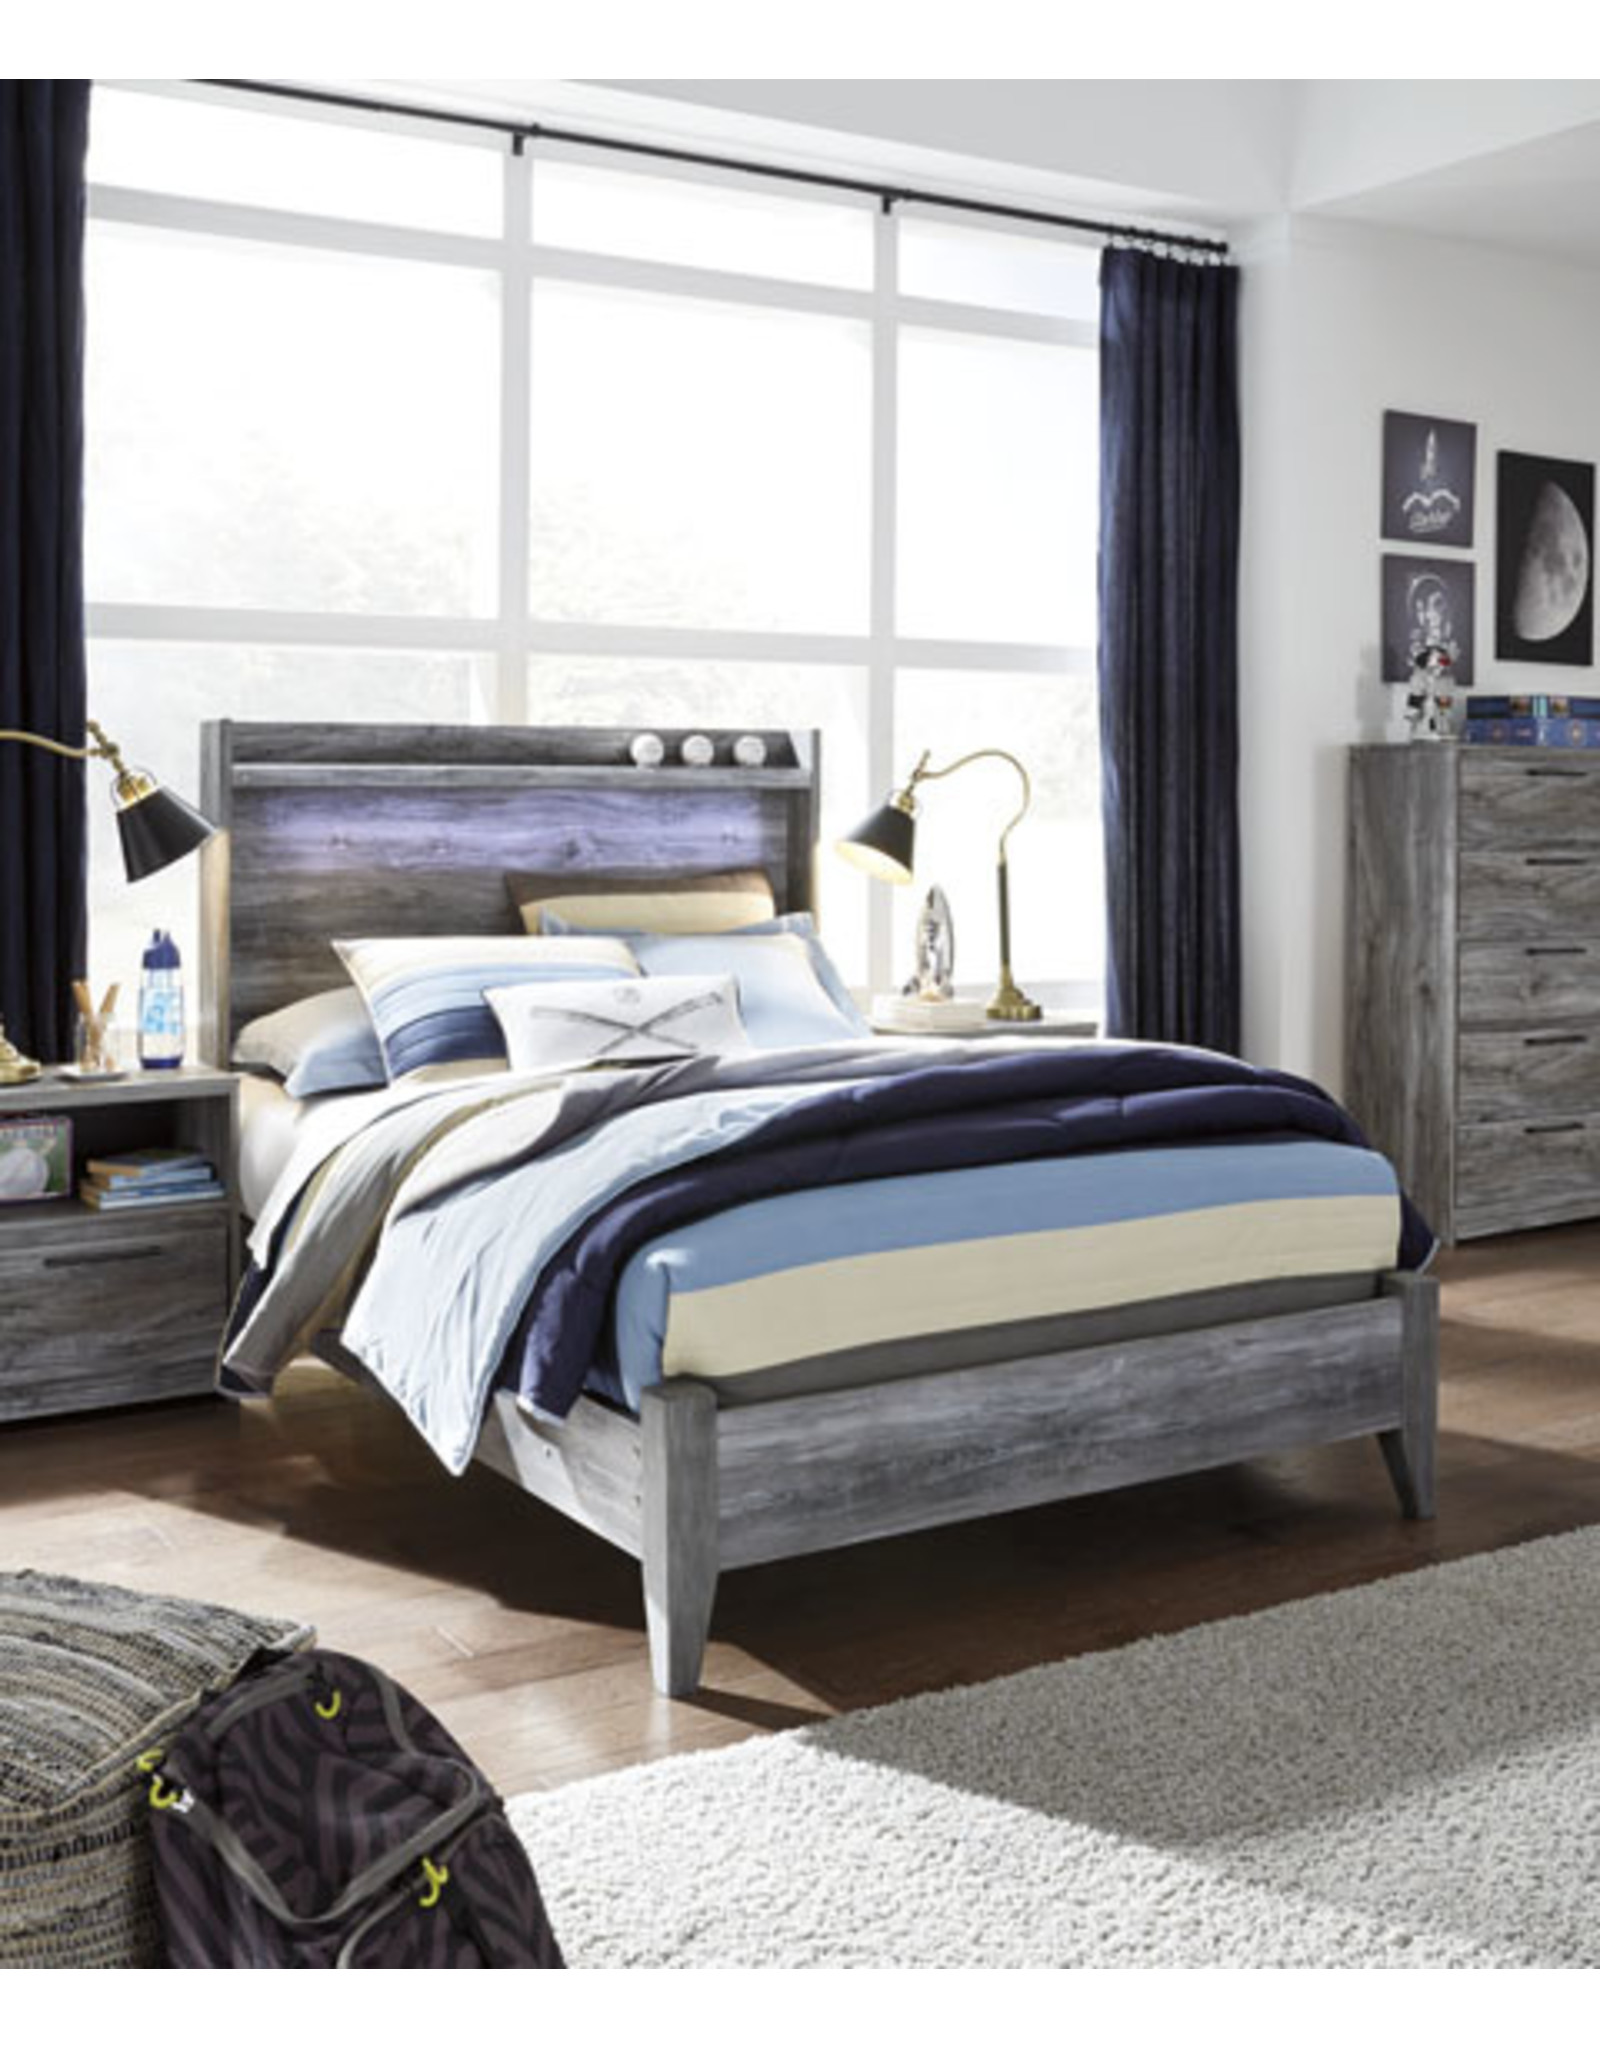 Baystorm B221-57/54 Queen Bed